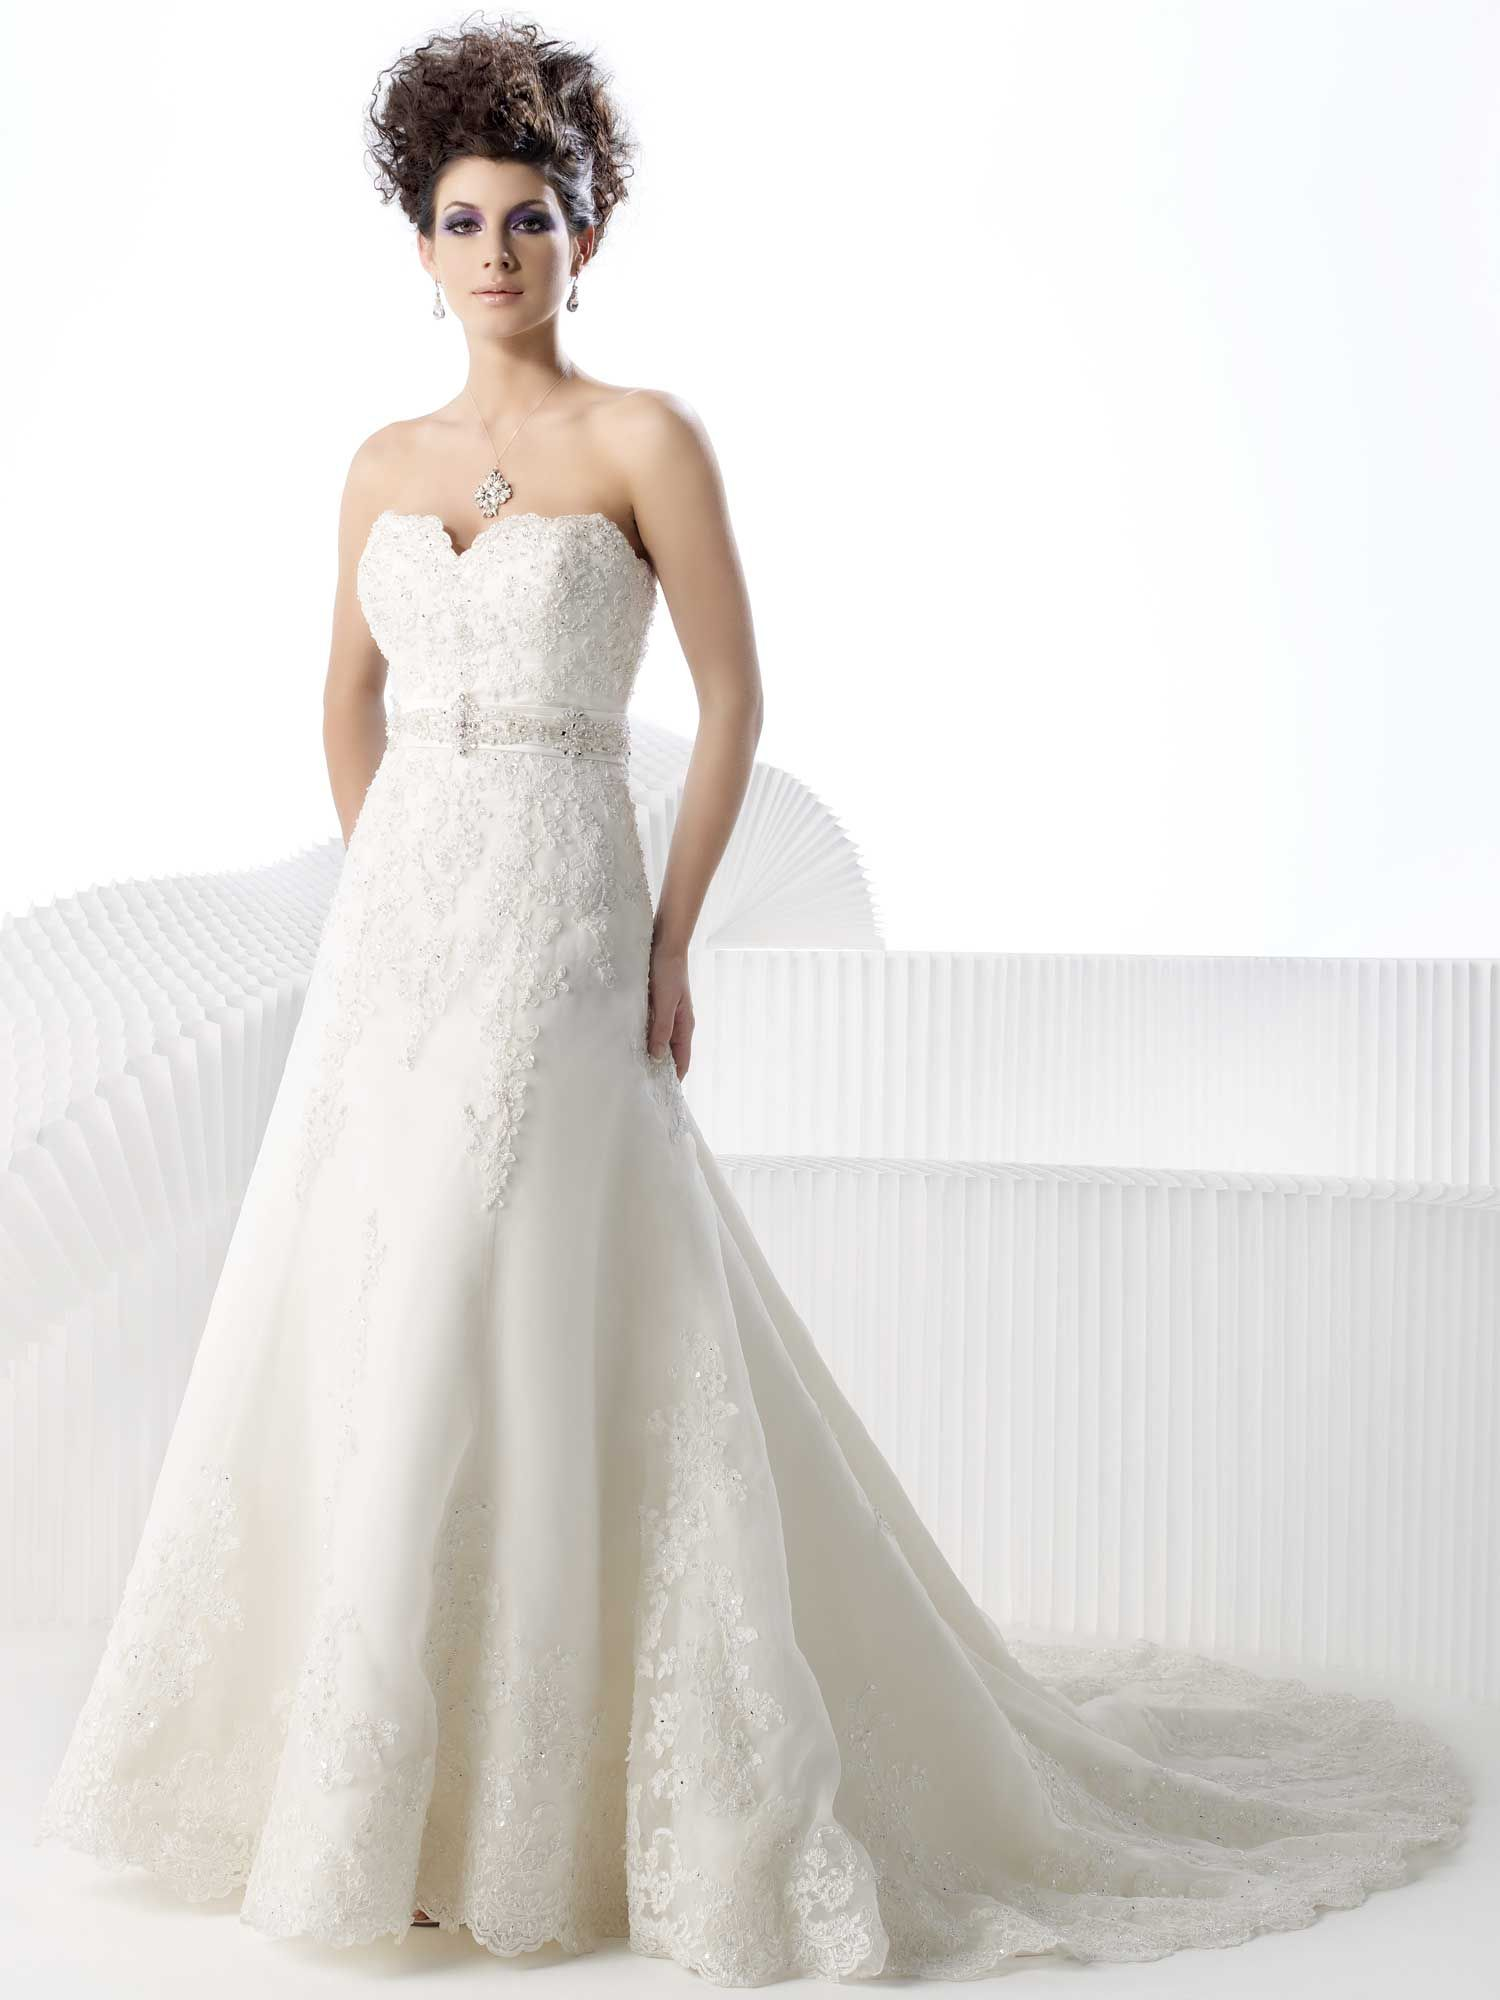 Scalloped neckline wedding gowns pinterest private label